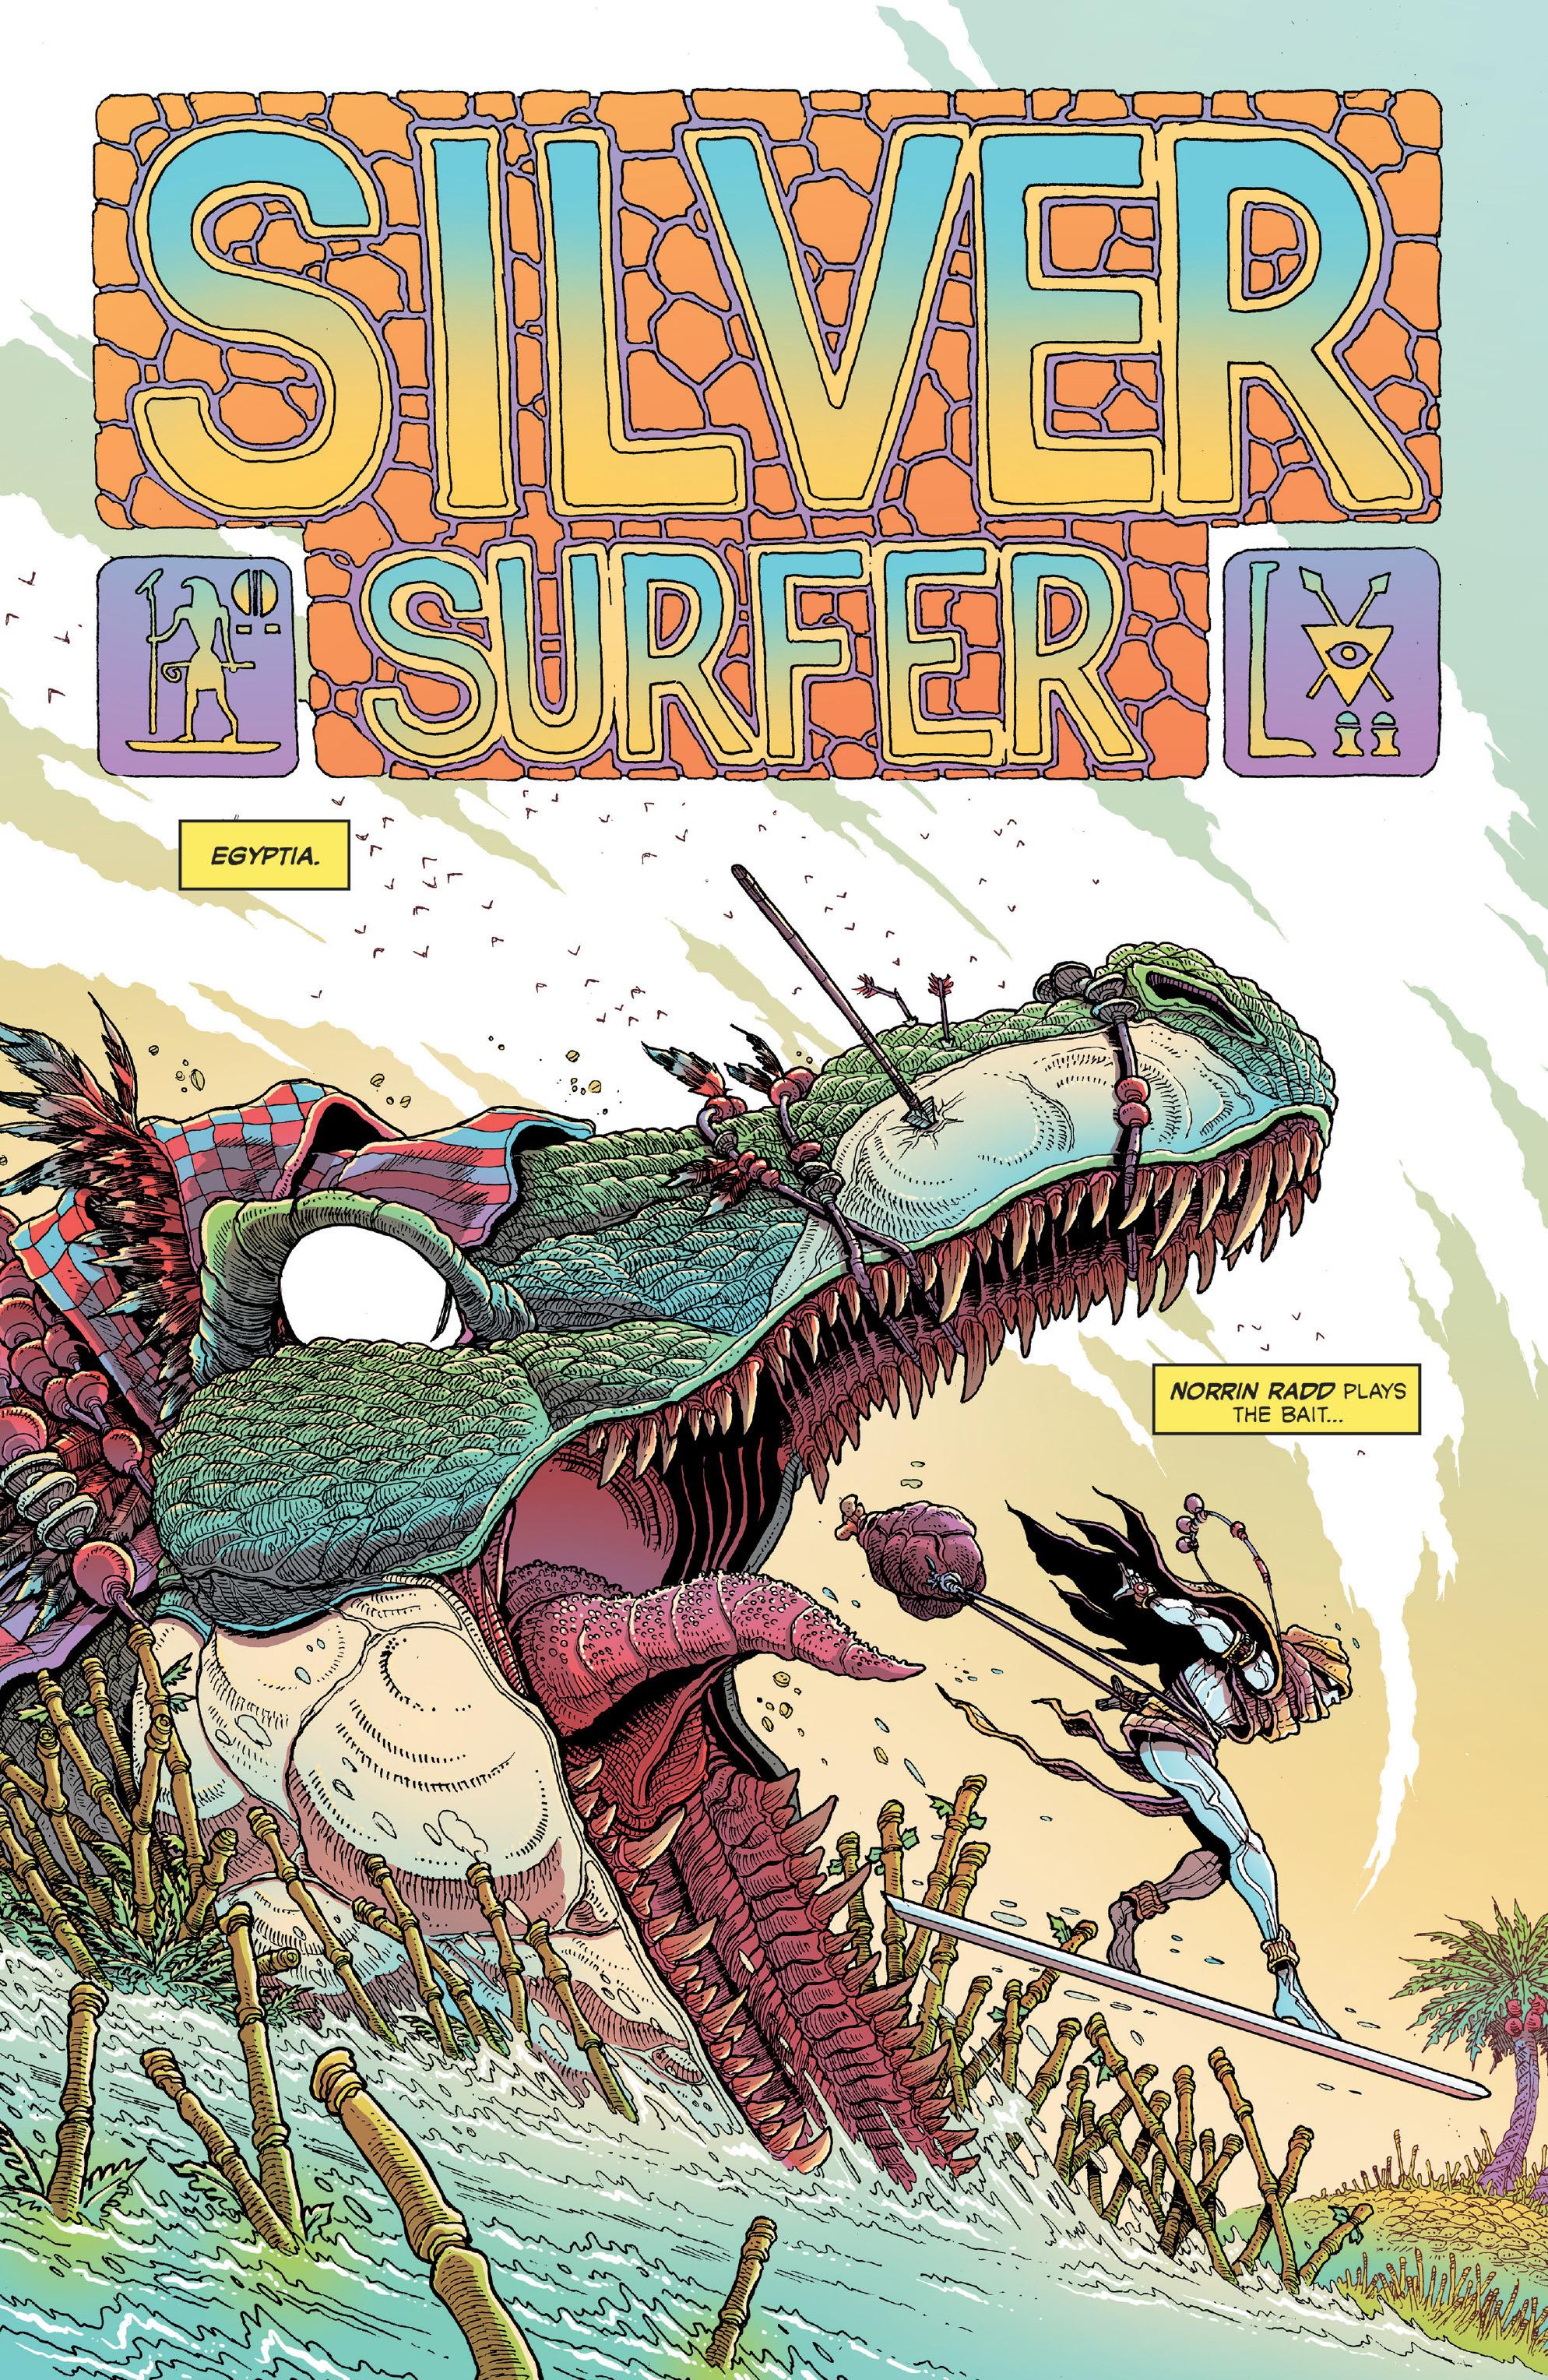 Read online Secret Wars: Battleworld comic -  Issue #4 - 3